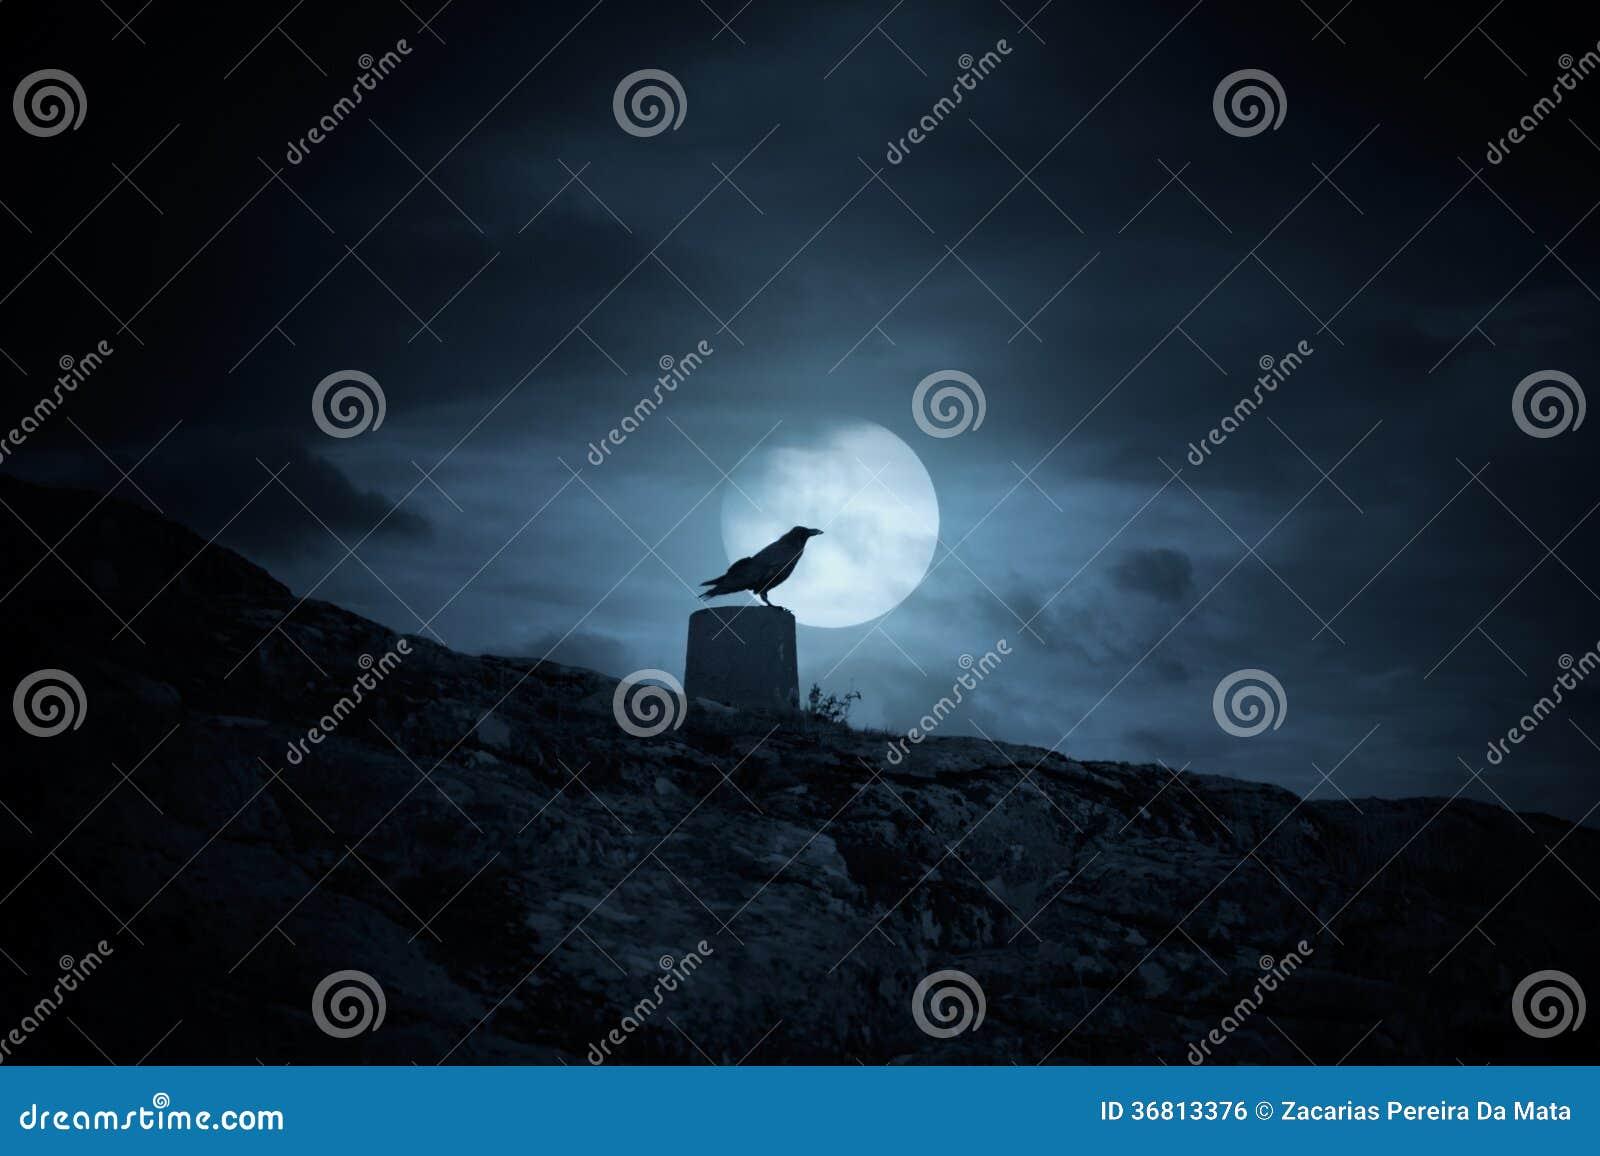 Full moon crow